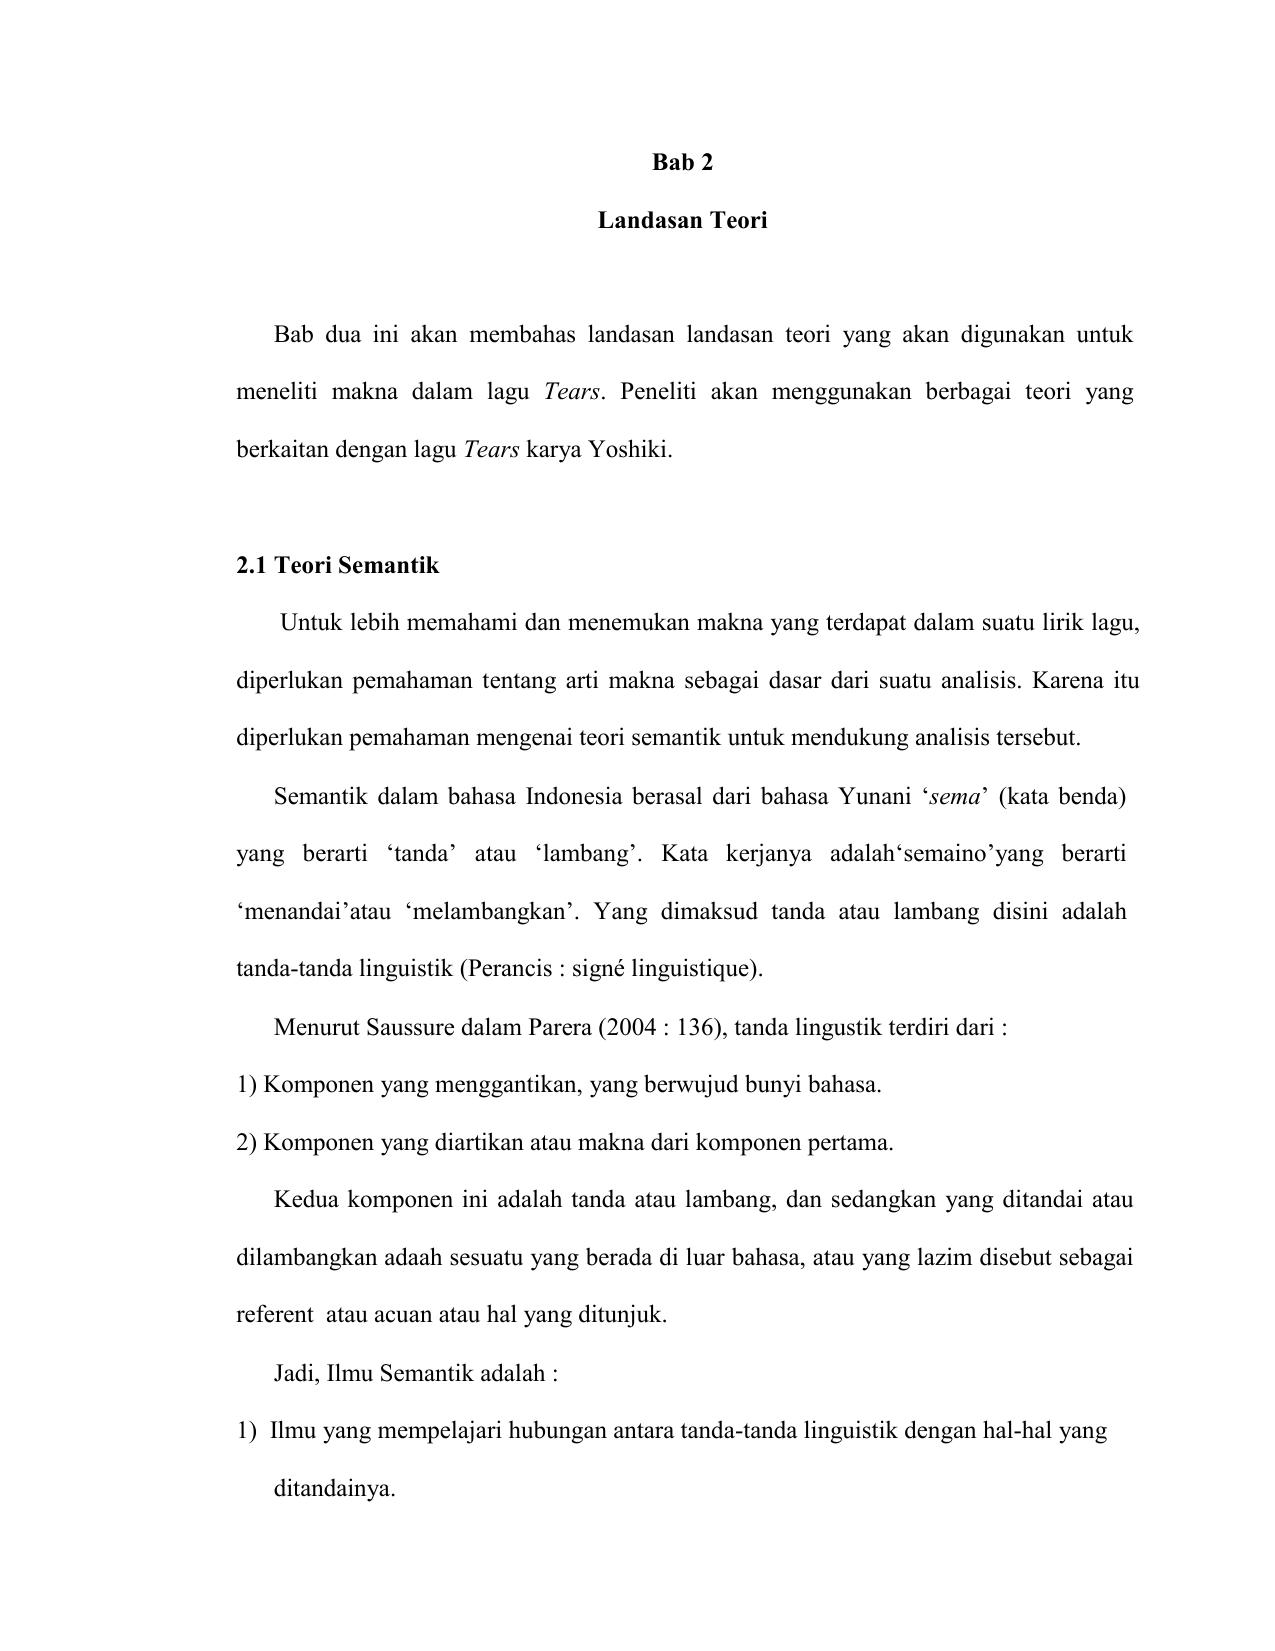 Skripsi Lengkap Dicky Yuspandi 1000874544 Sastra Jepang